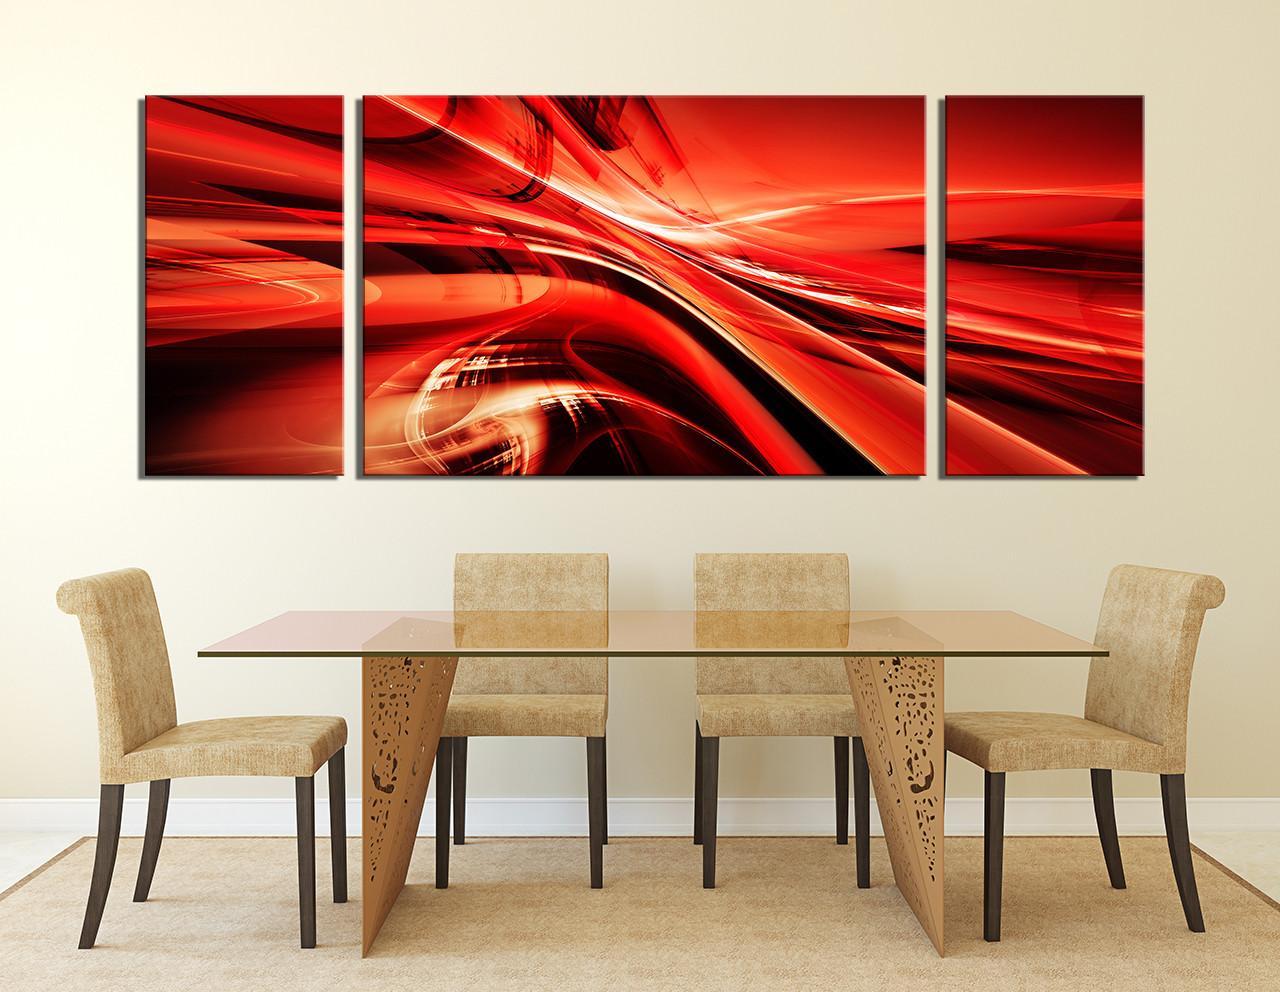 3 Piece Wall Art, Dining Room Wall Art, Red Wall Decor, Modern Canvas